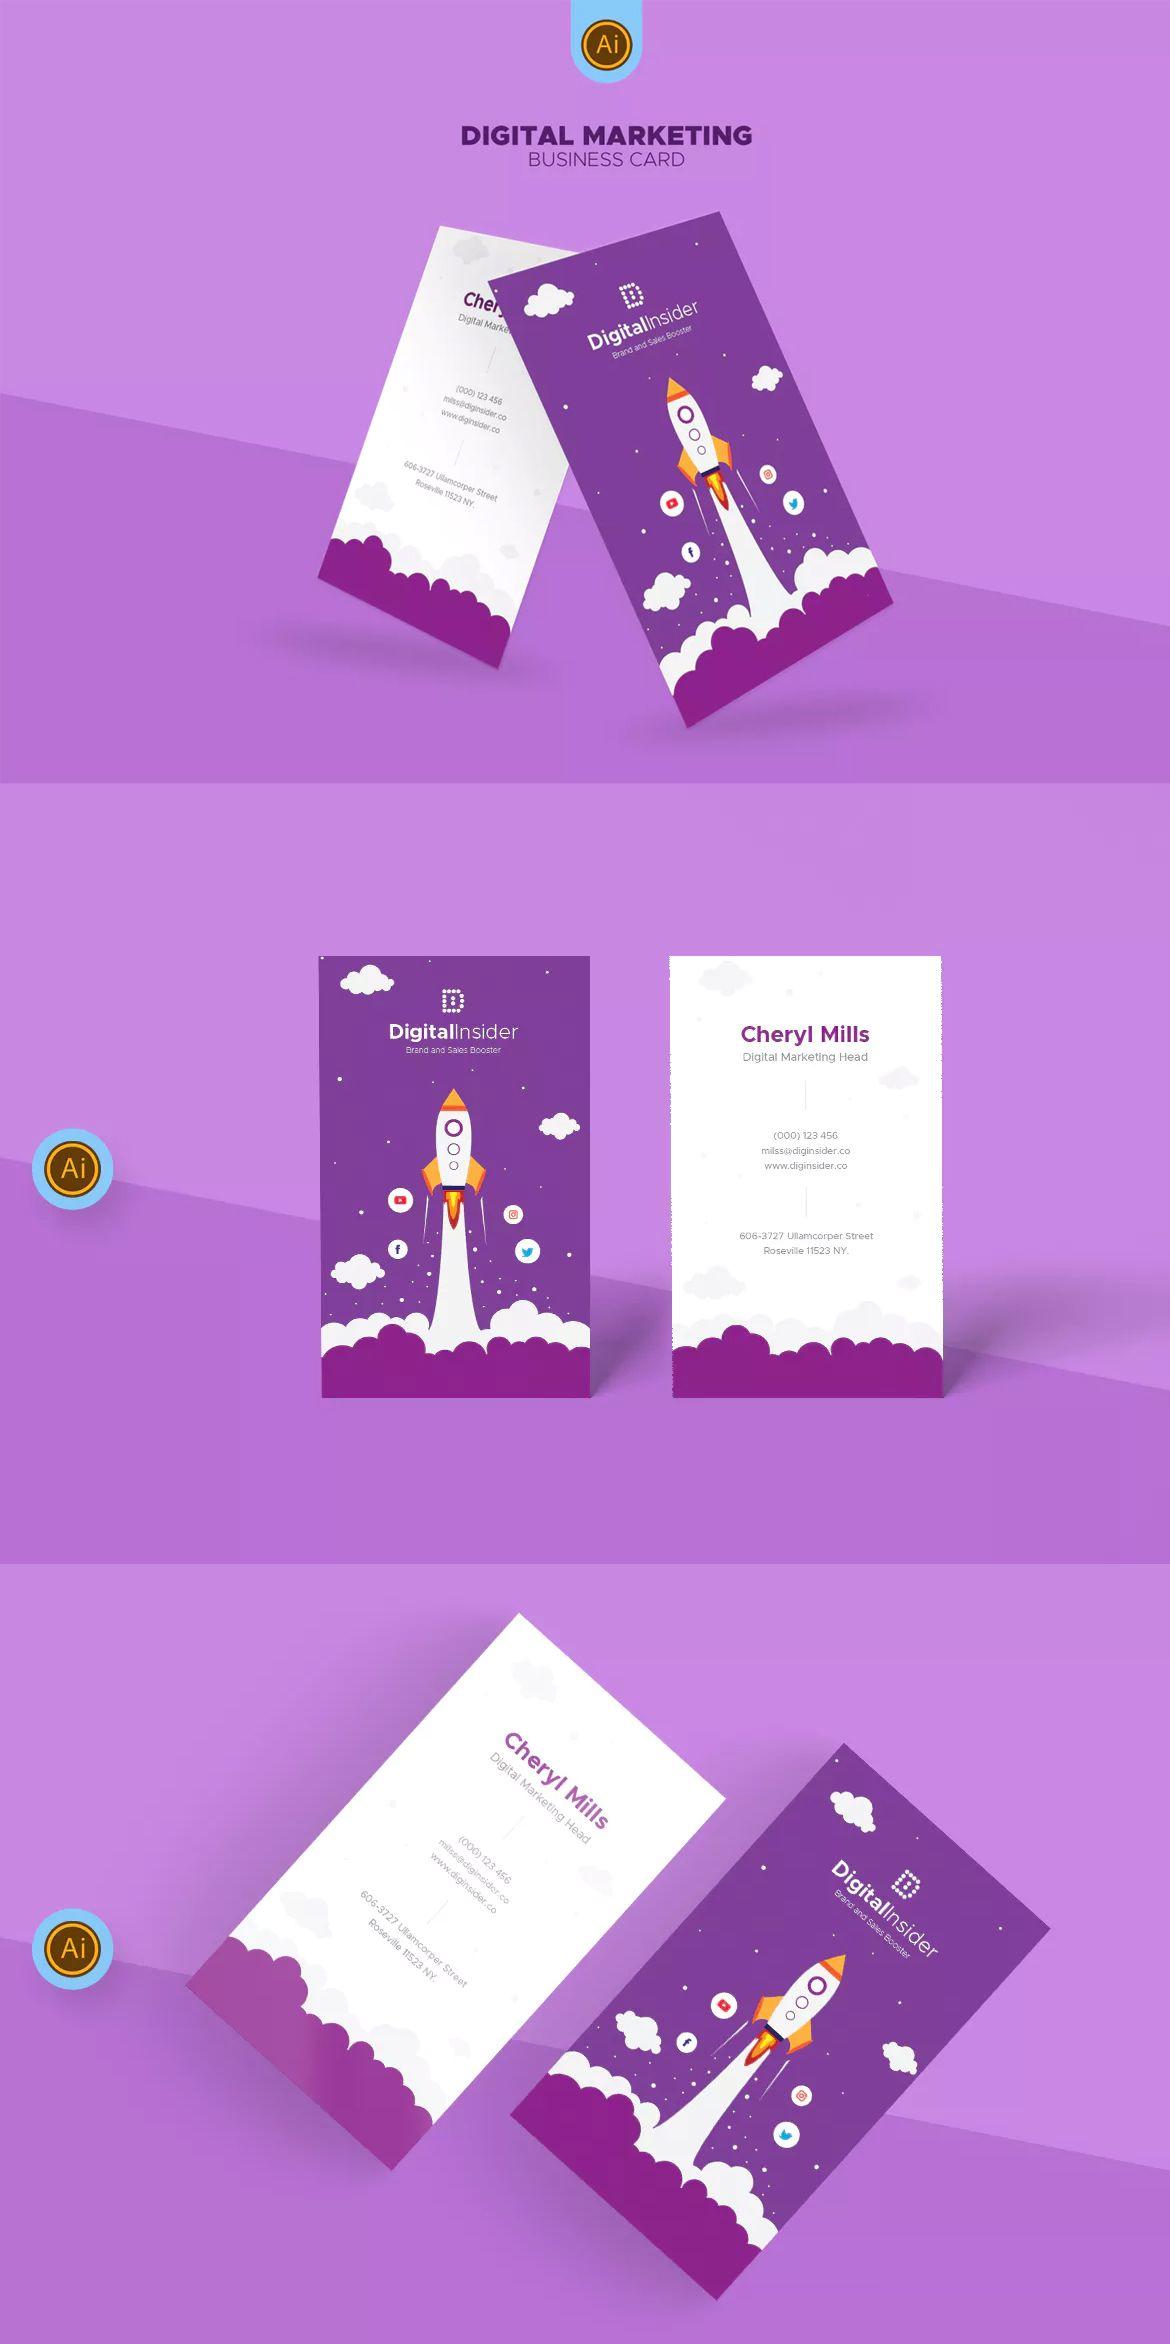 digital marketing business card template ai